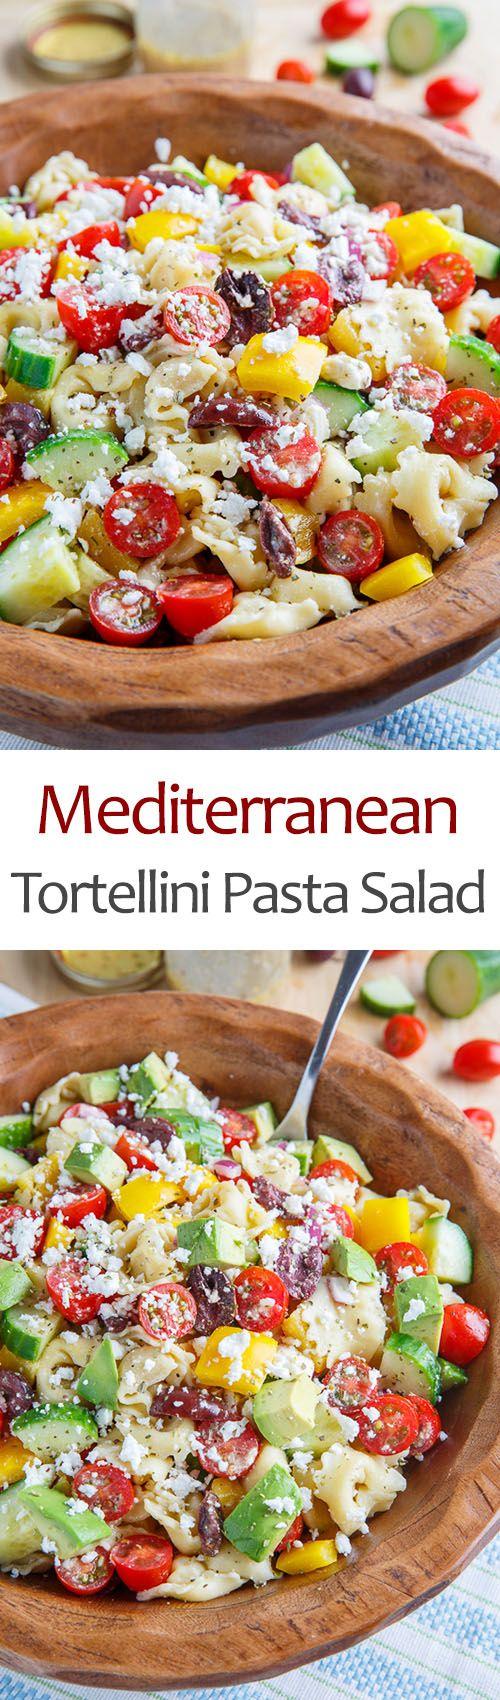 Mediterranean Tortellini Salad. I've had those tortellini in the fridge for over a week, this looks worthy